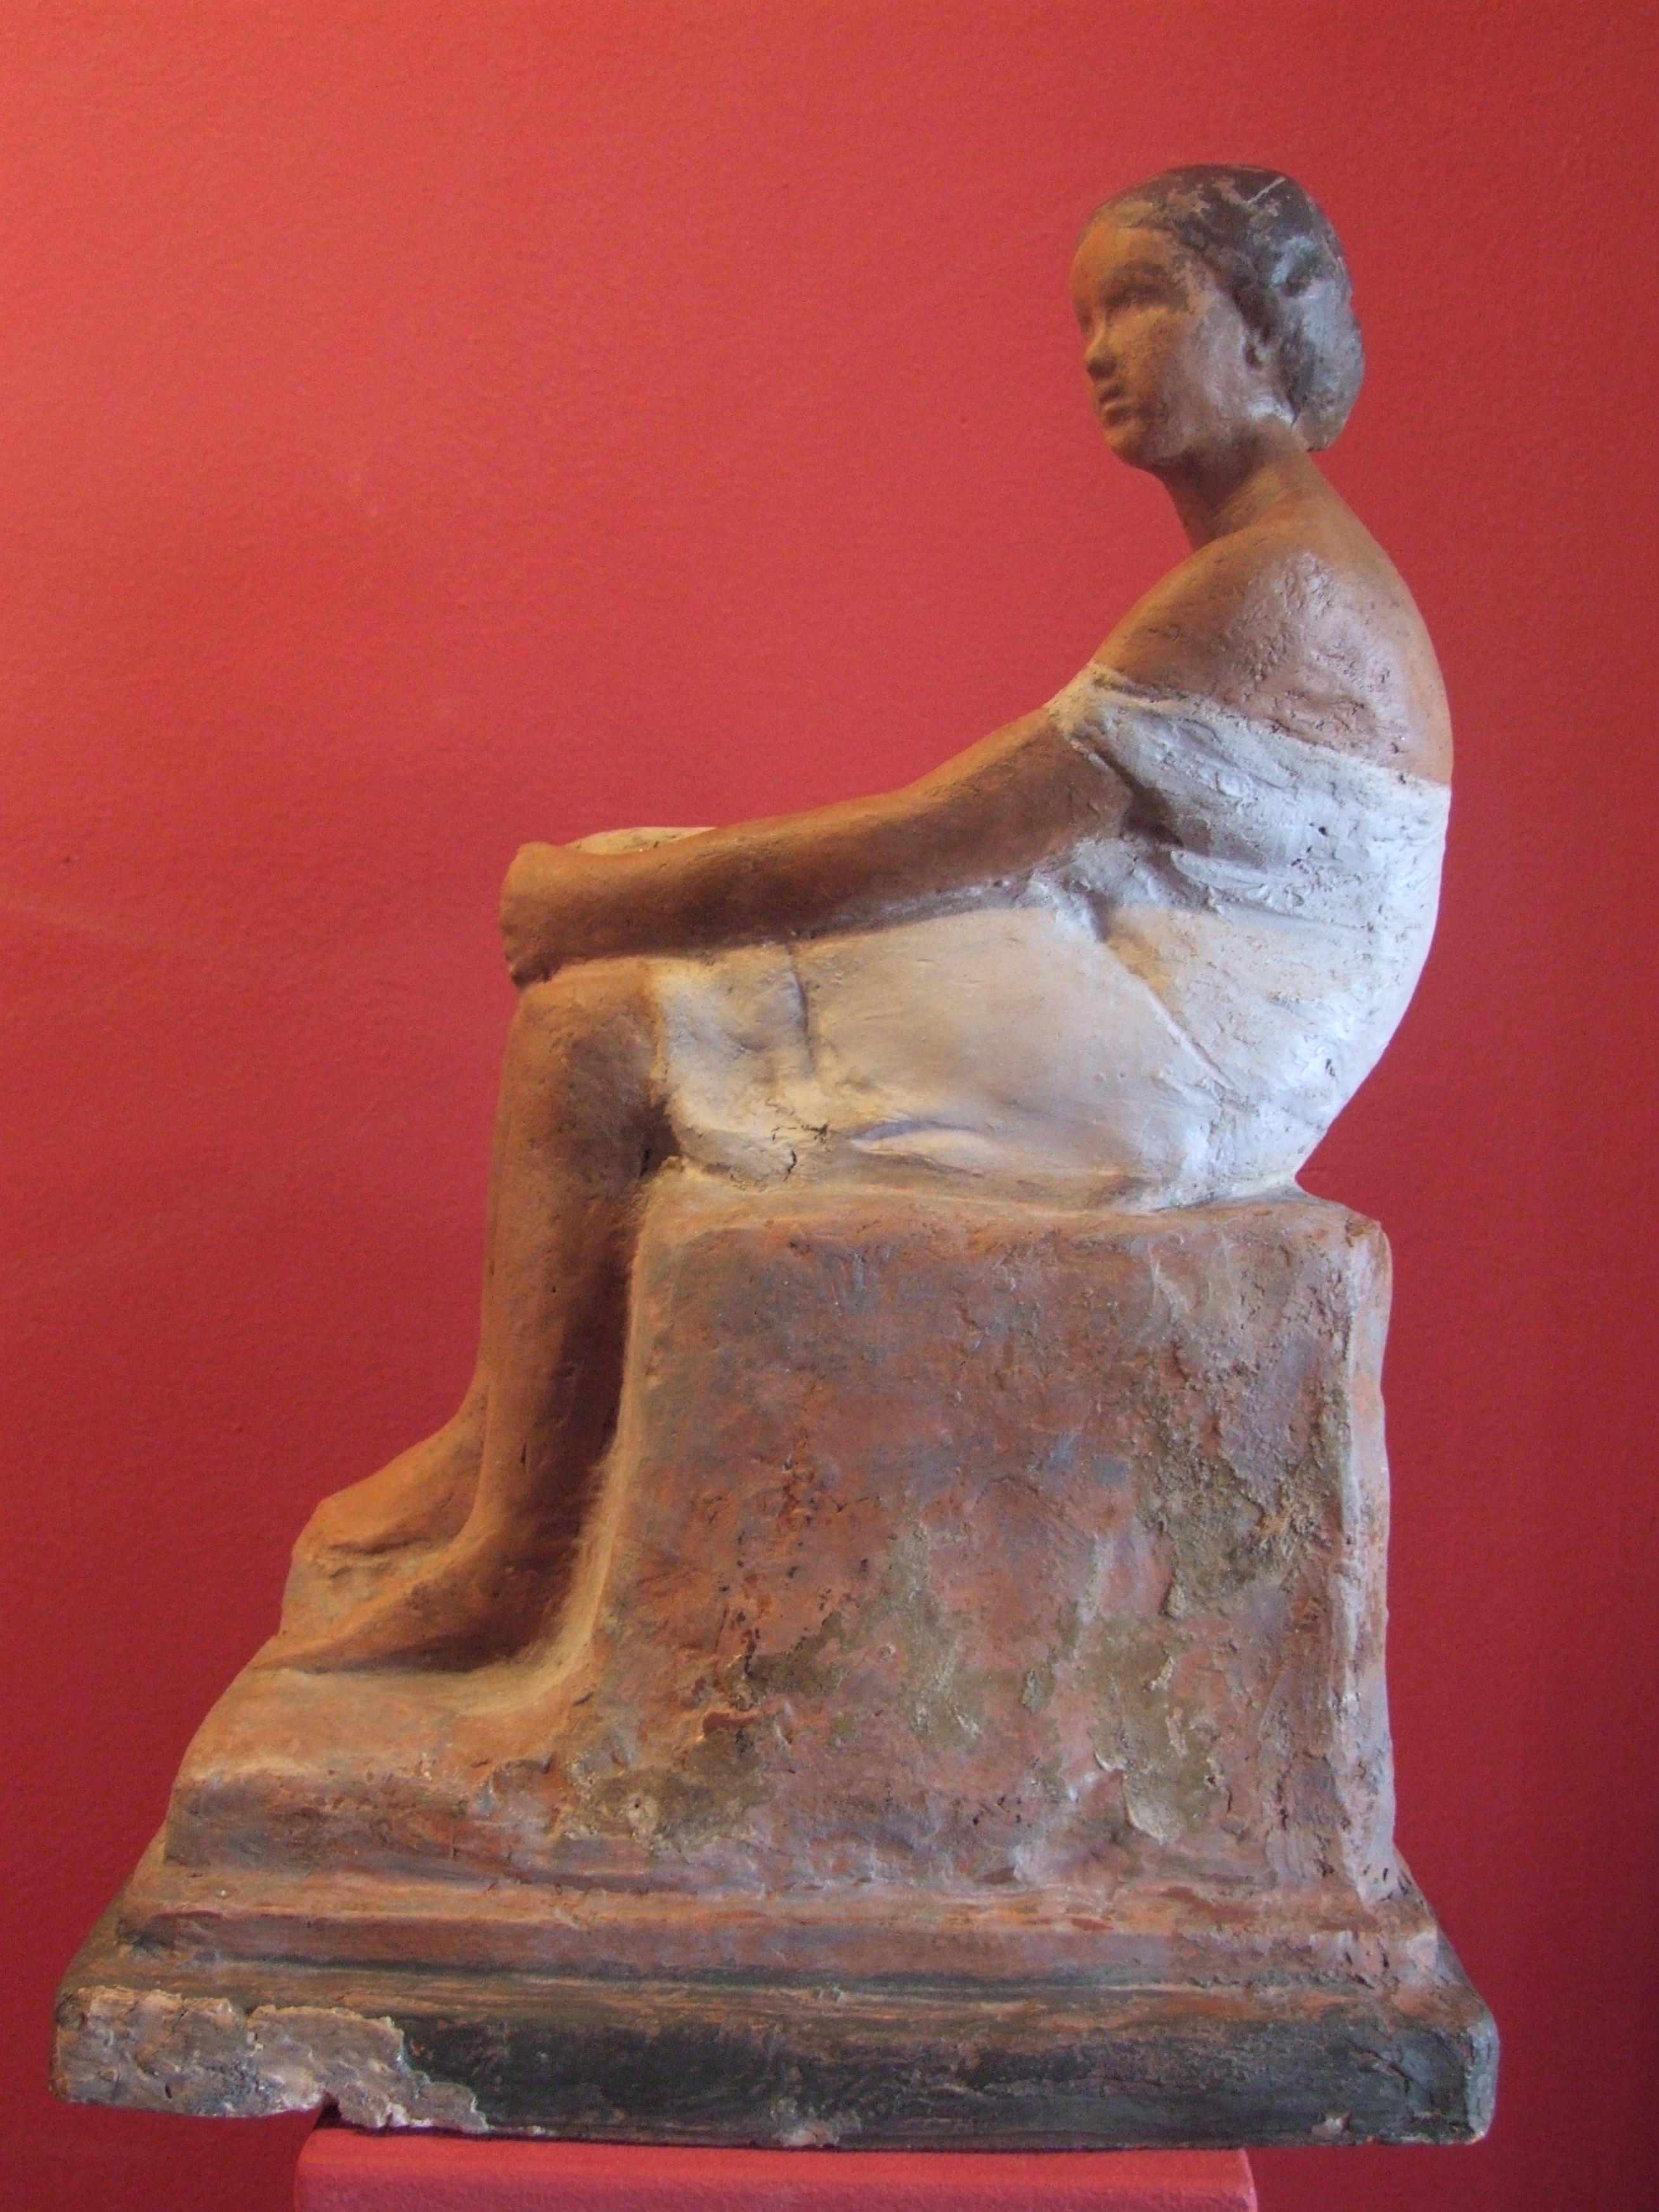 Medgyessy, Ferenc: Sitting woman